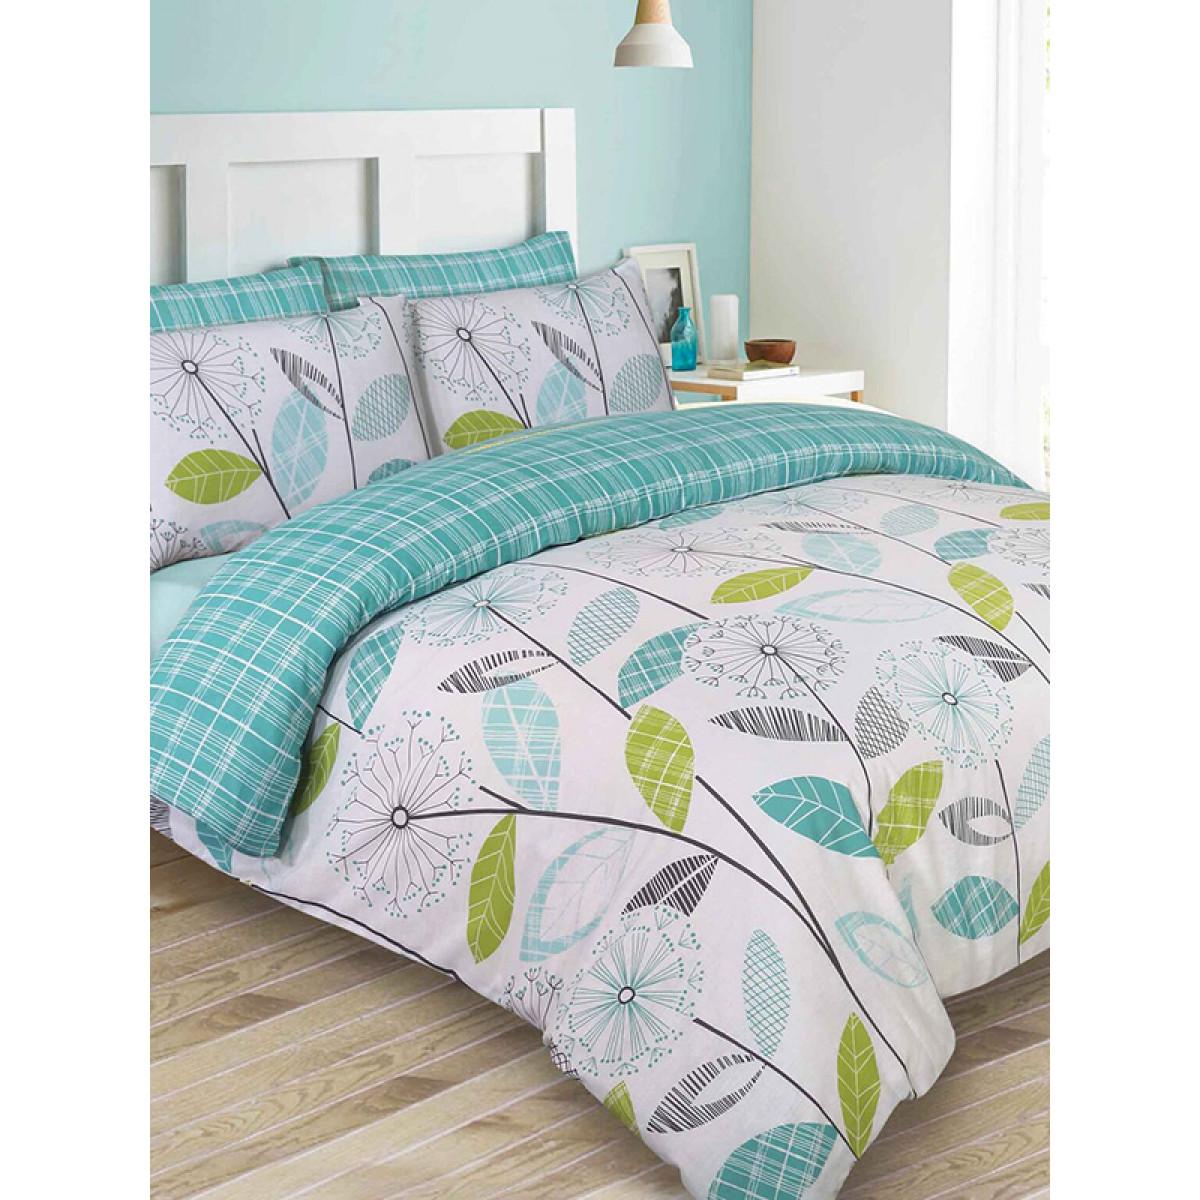 Allium Dandelion Teal King Size Duvet Cover And Pillowcase